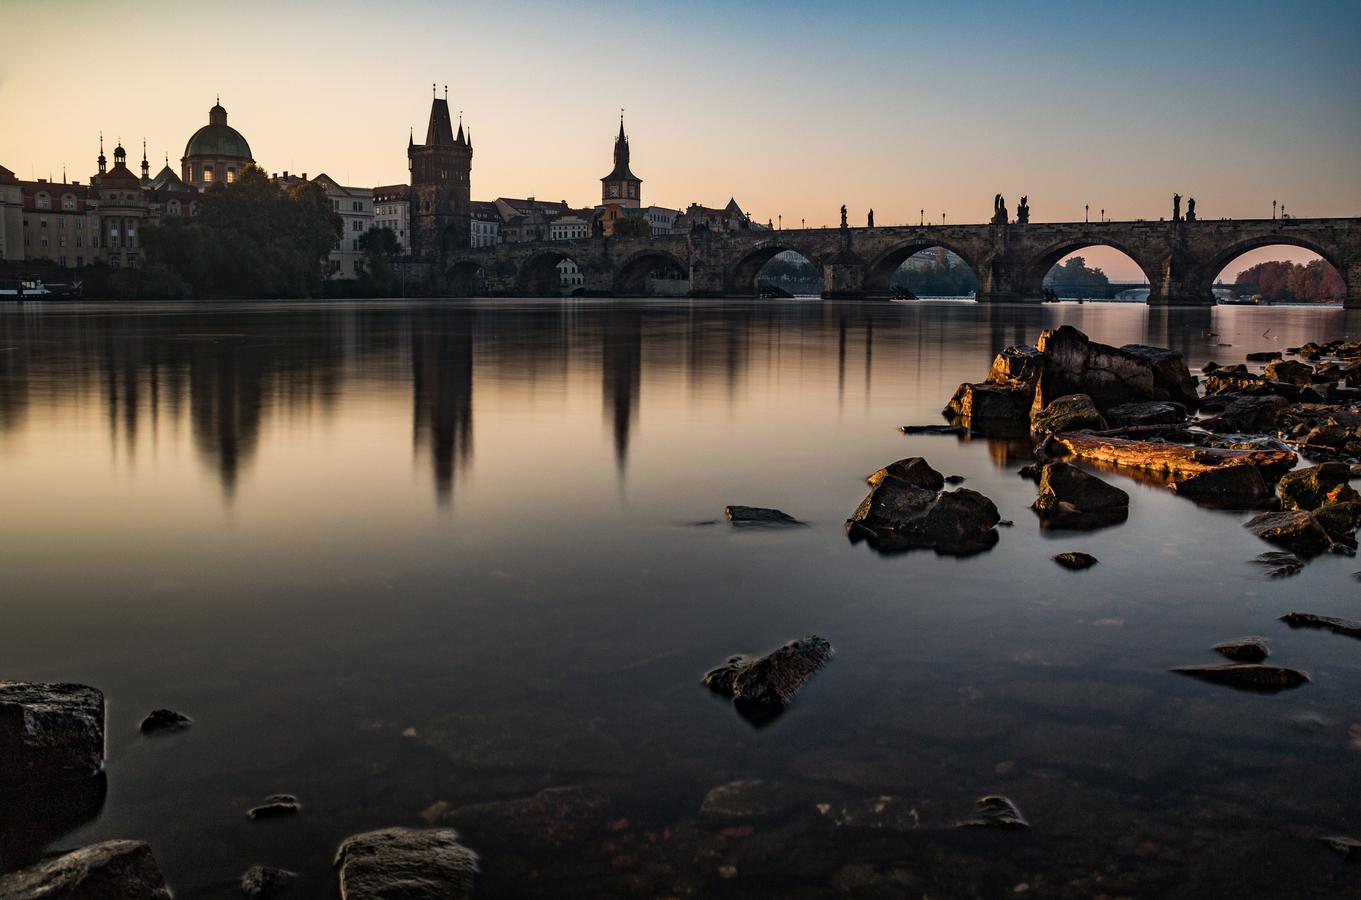 Klidné ráno u Karlova mostu